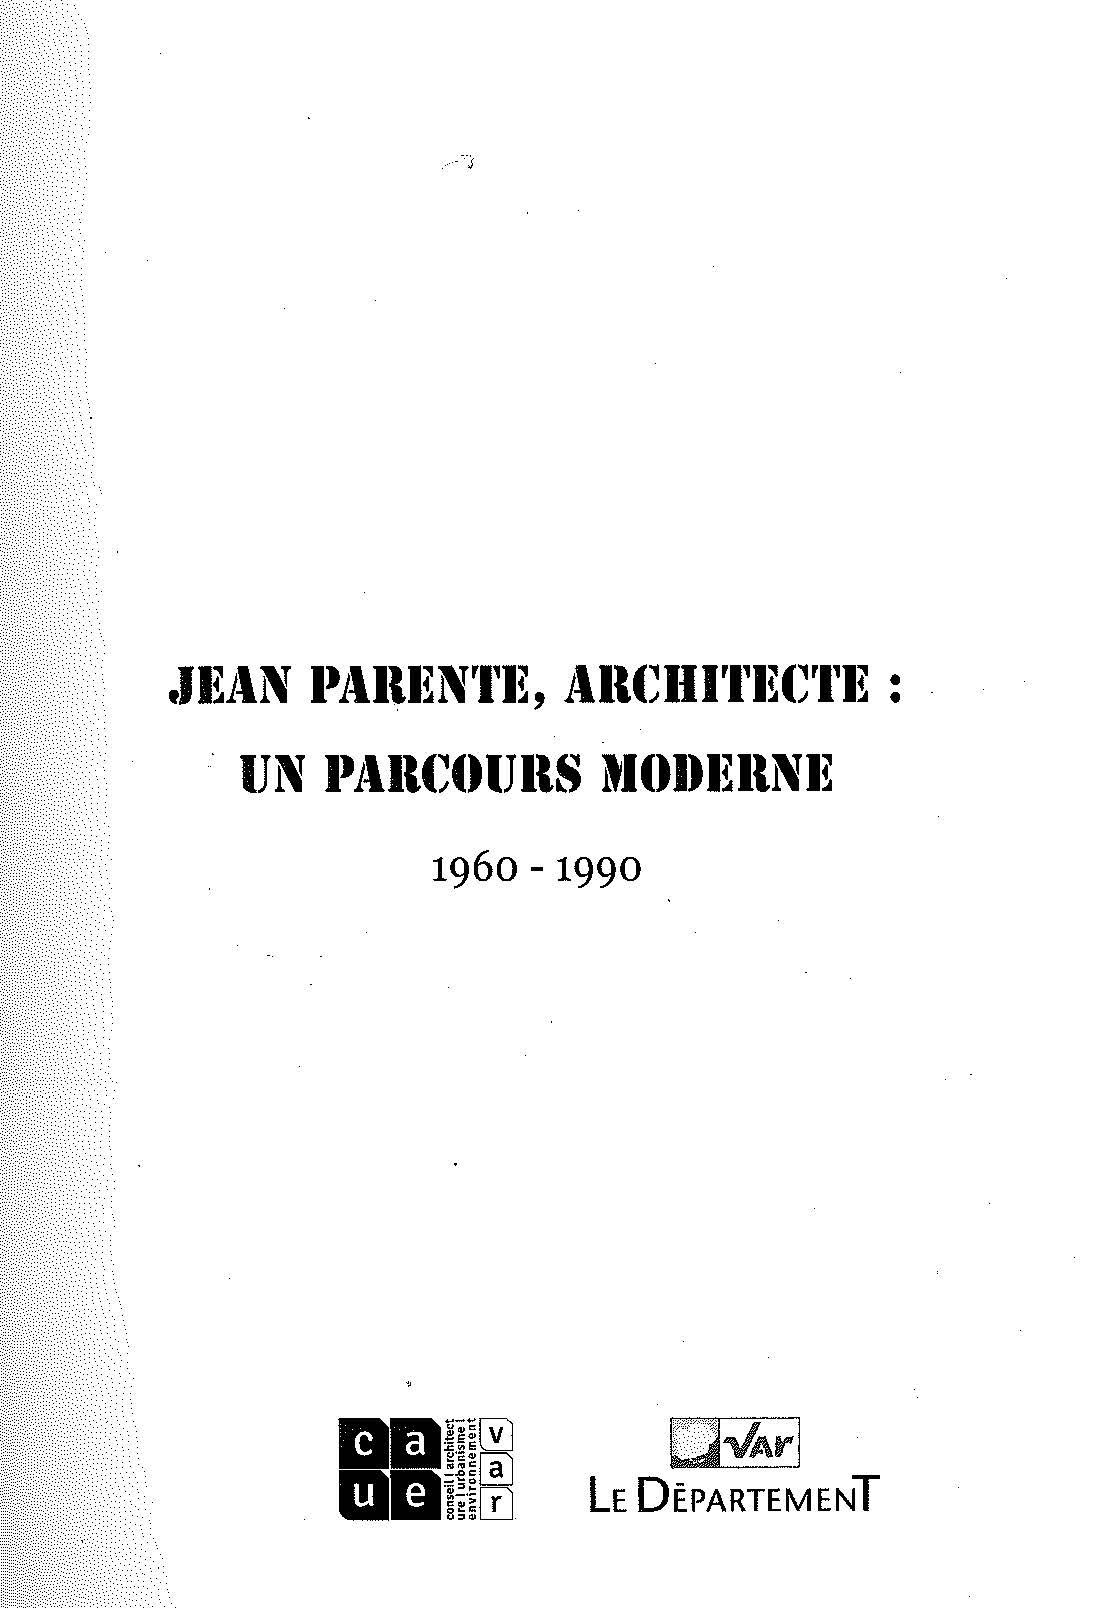 Jean PARENTE, architecte